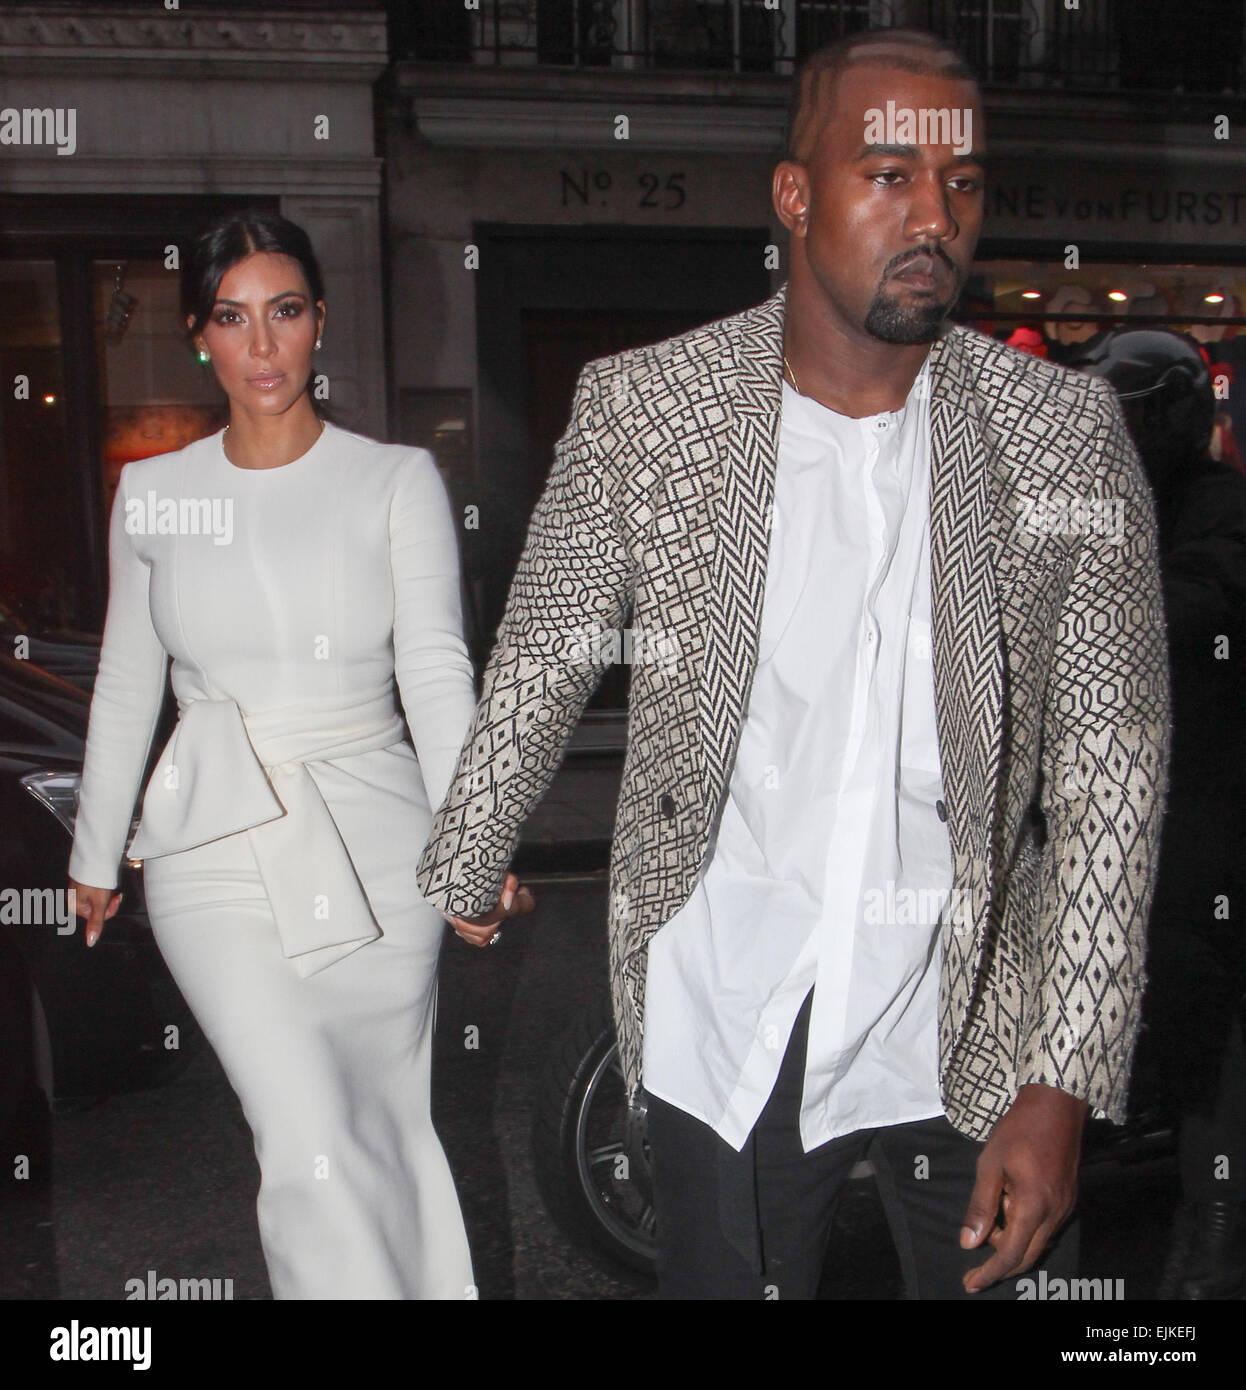 Awesome Kim Kardashian And Kanye West Arrive For A Dinner At Hakkasan Short Hairstyles Gunalazisus